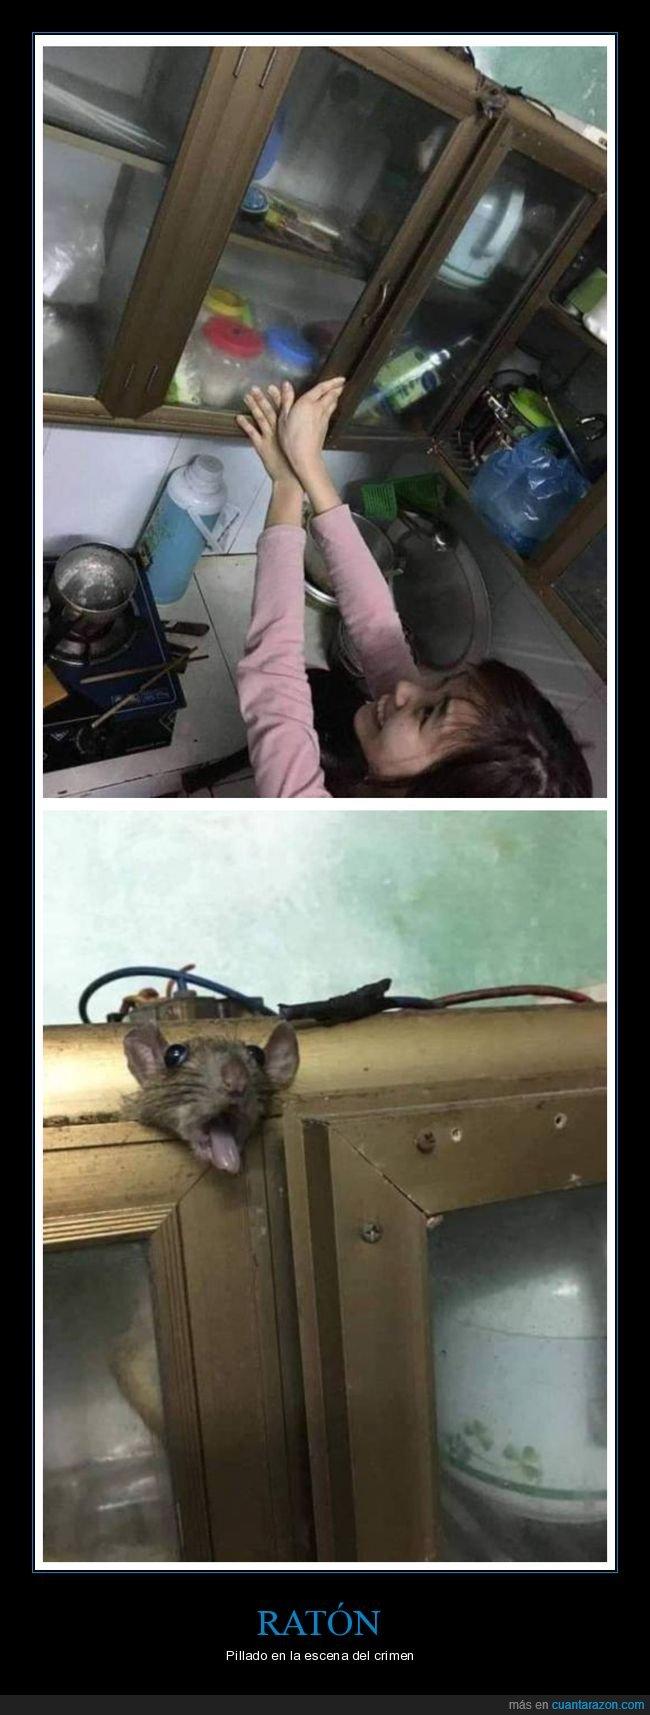 armario,pillado,puerta,ratón